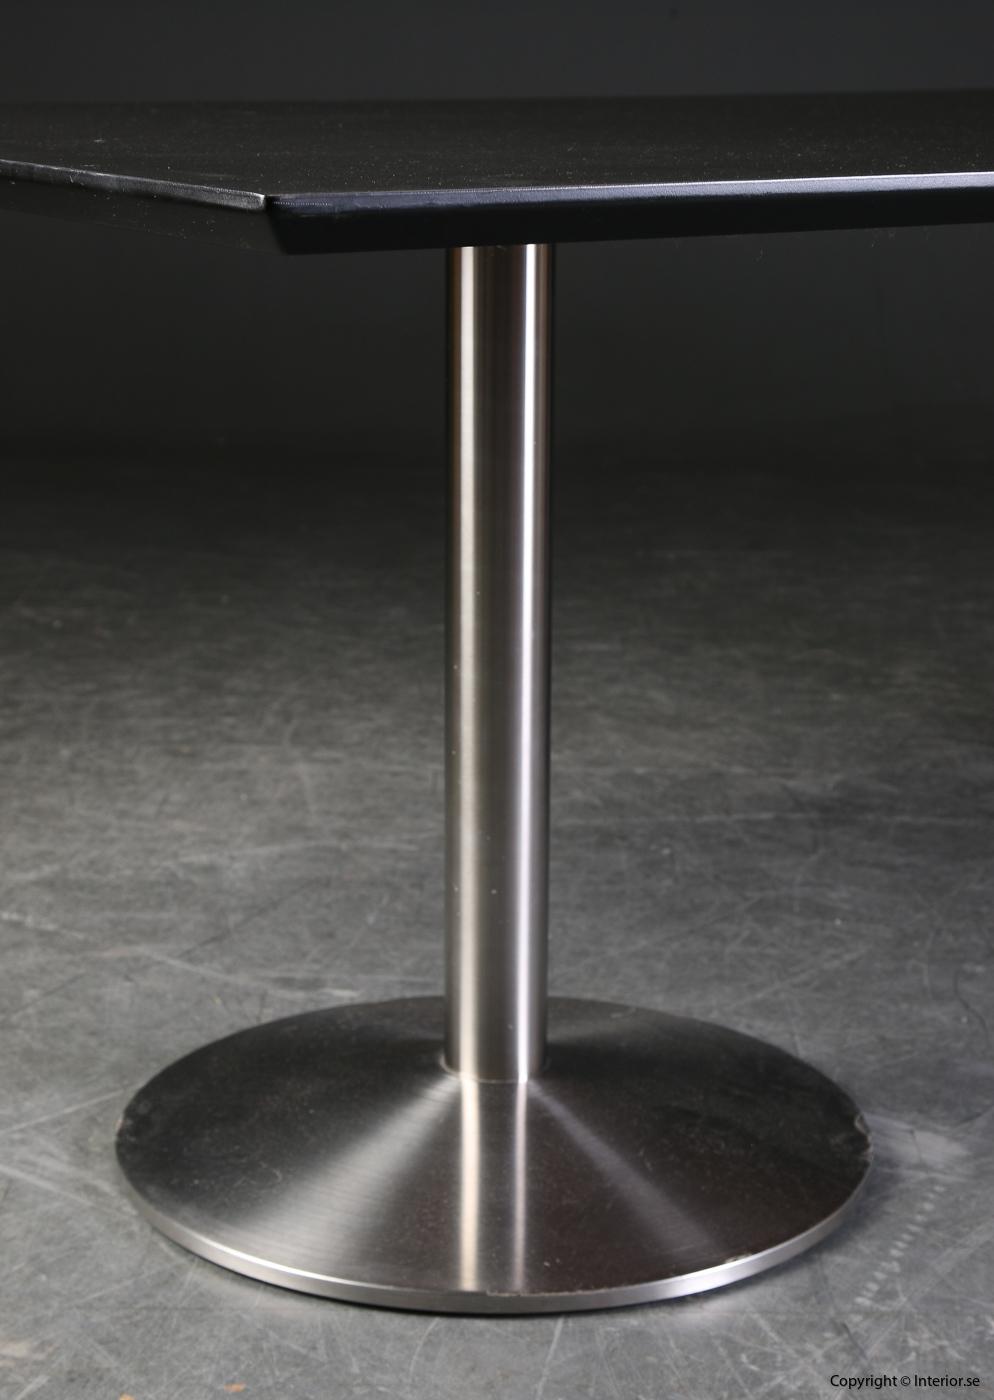 Konferensbord conference table, Svart linoleum - 220 x 110 cm 3